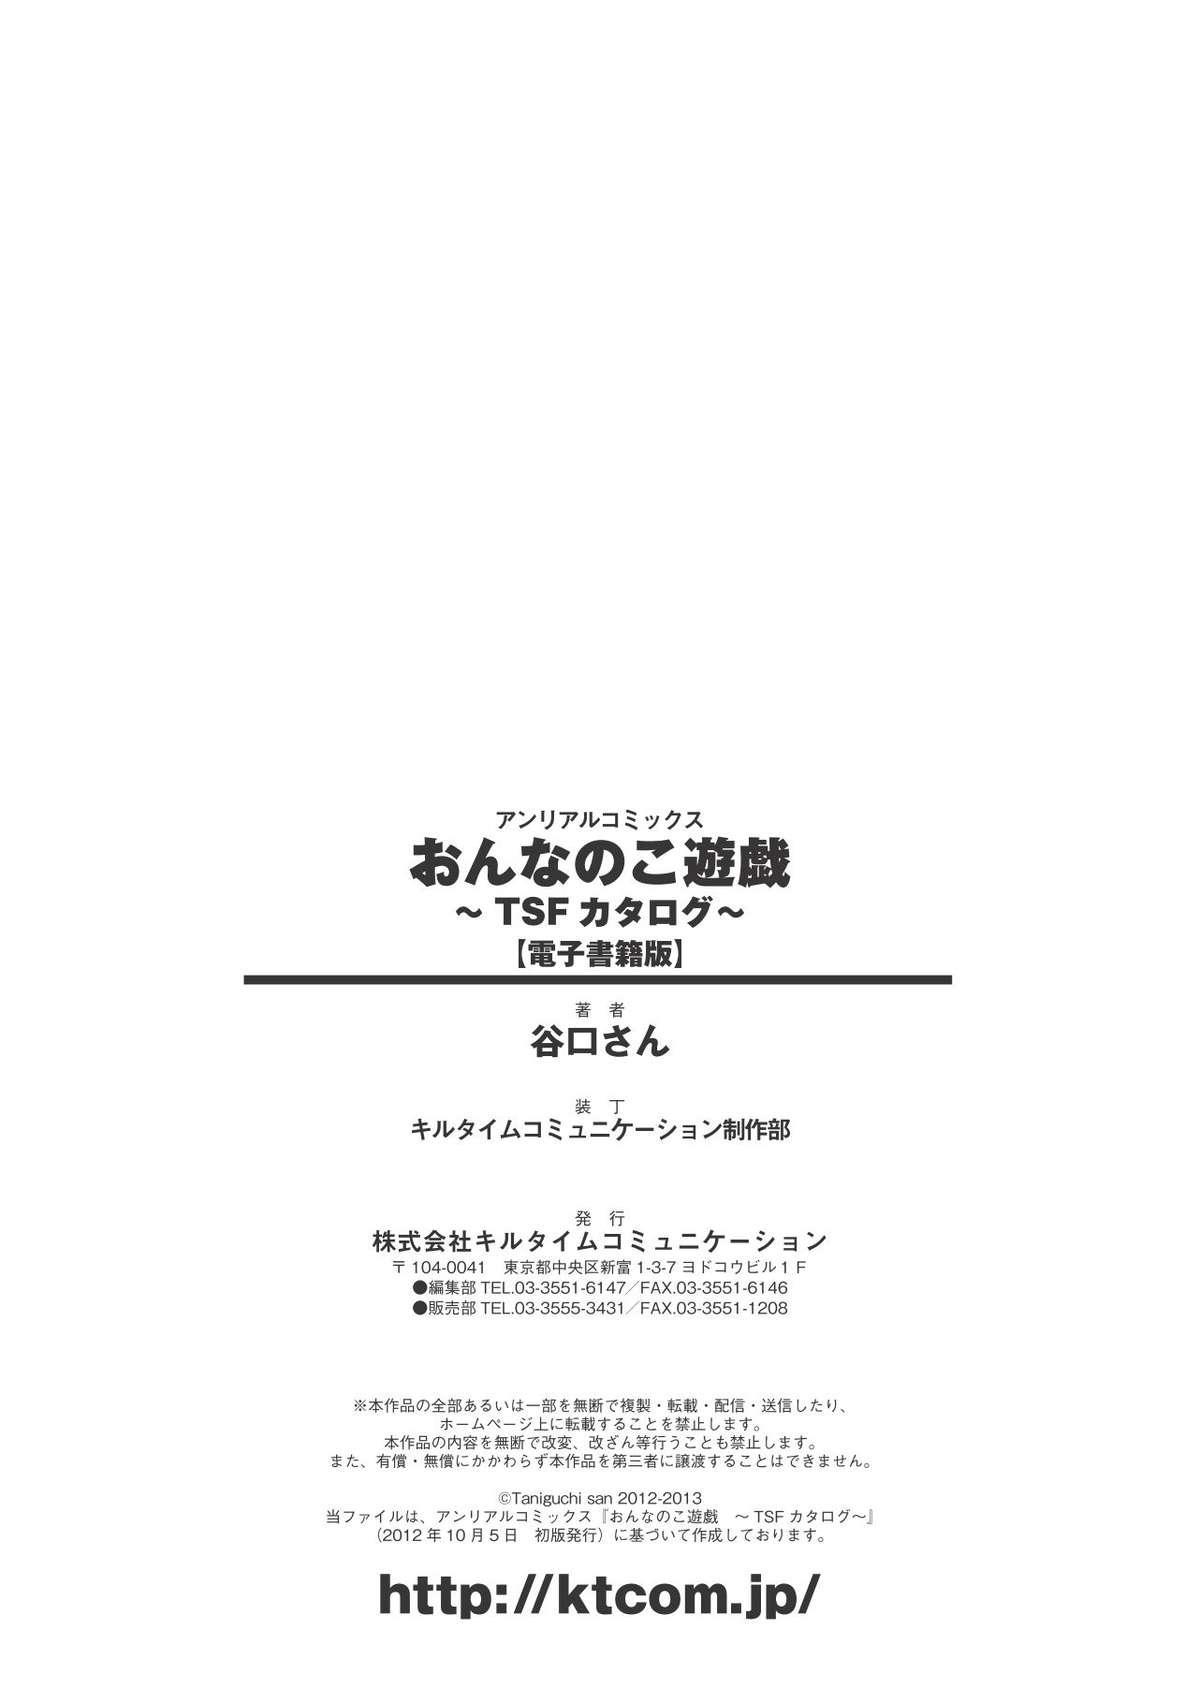 [Taniguchi-san] Girl Play - Trans-Sexual Fiction the Girls Play - ⚤TSF Catalog (English) {doujin-moe.us} 177